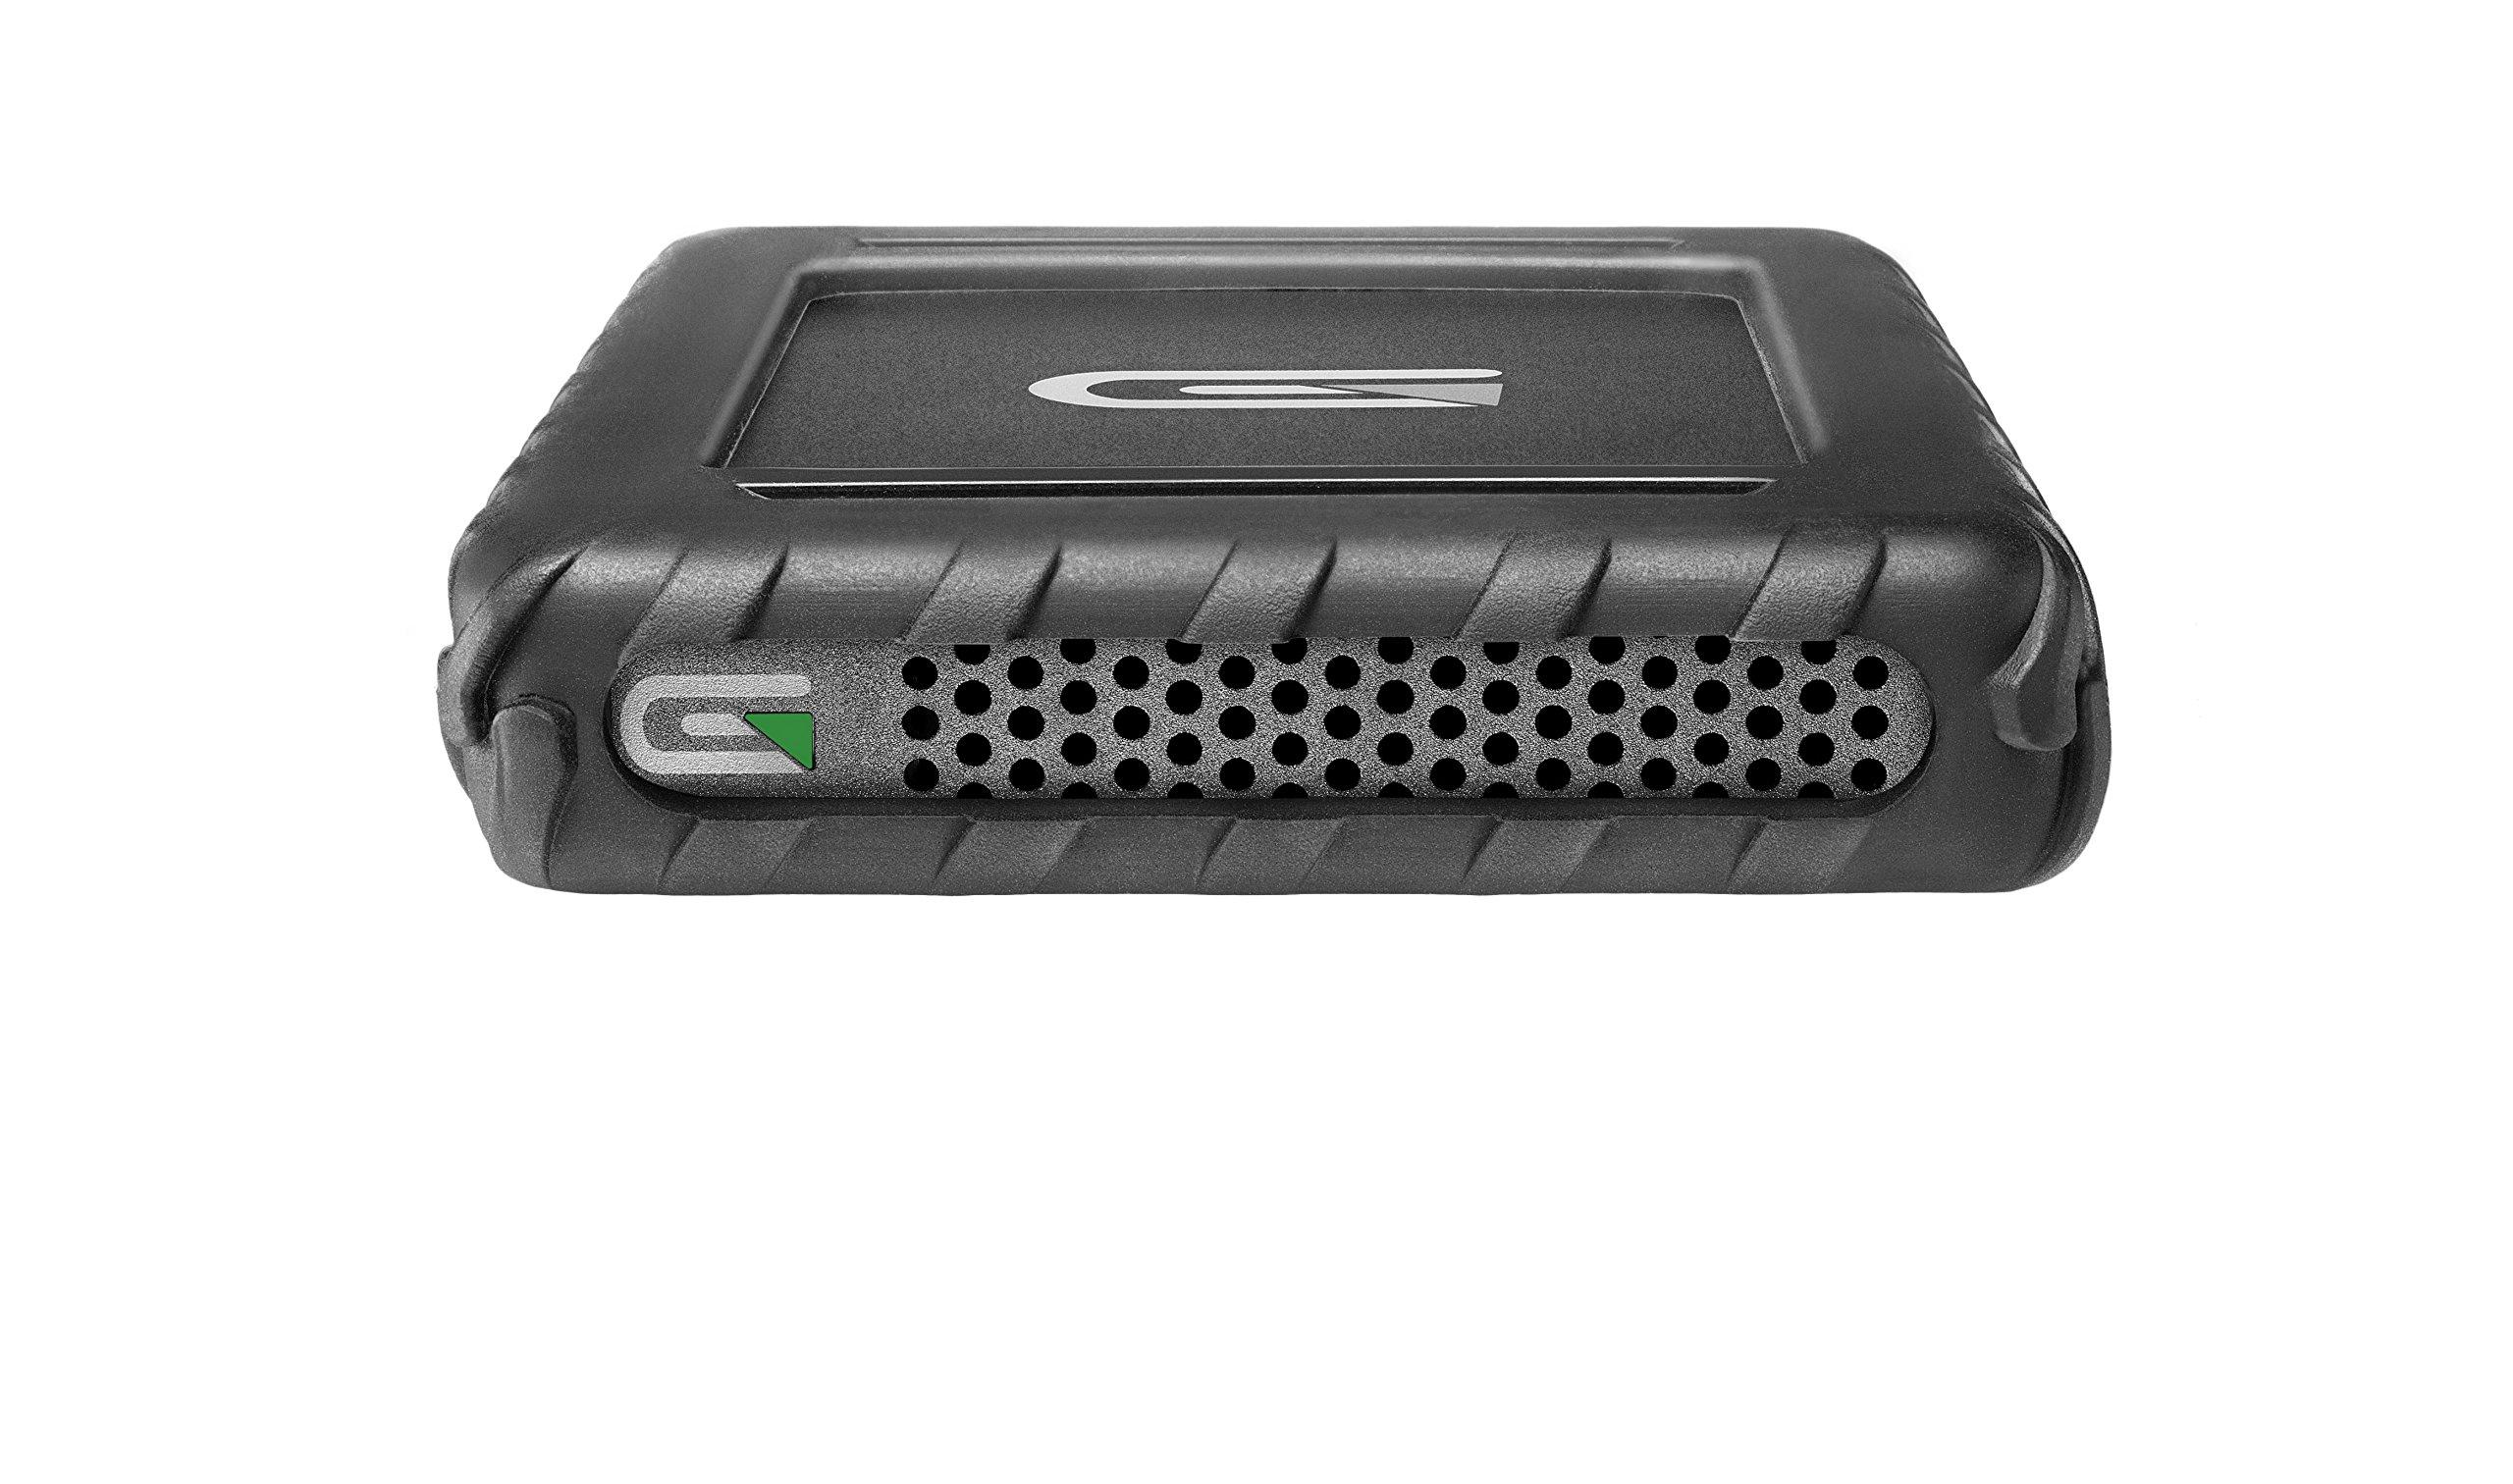 BlackBox Plus SSD 1TB (USB-C, Thunderbolt 3) BBPLSSD1000 by Glyph